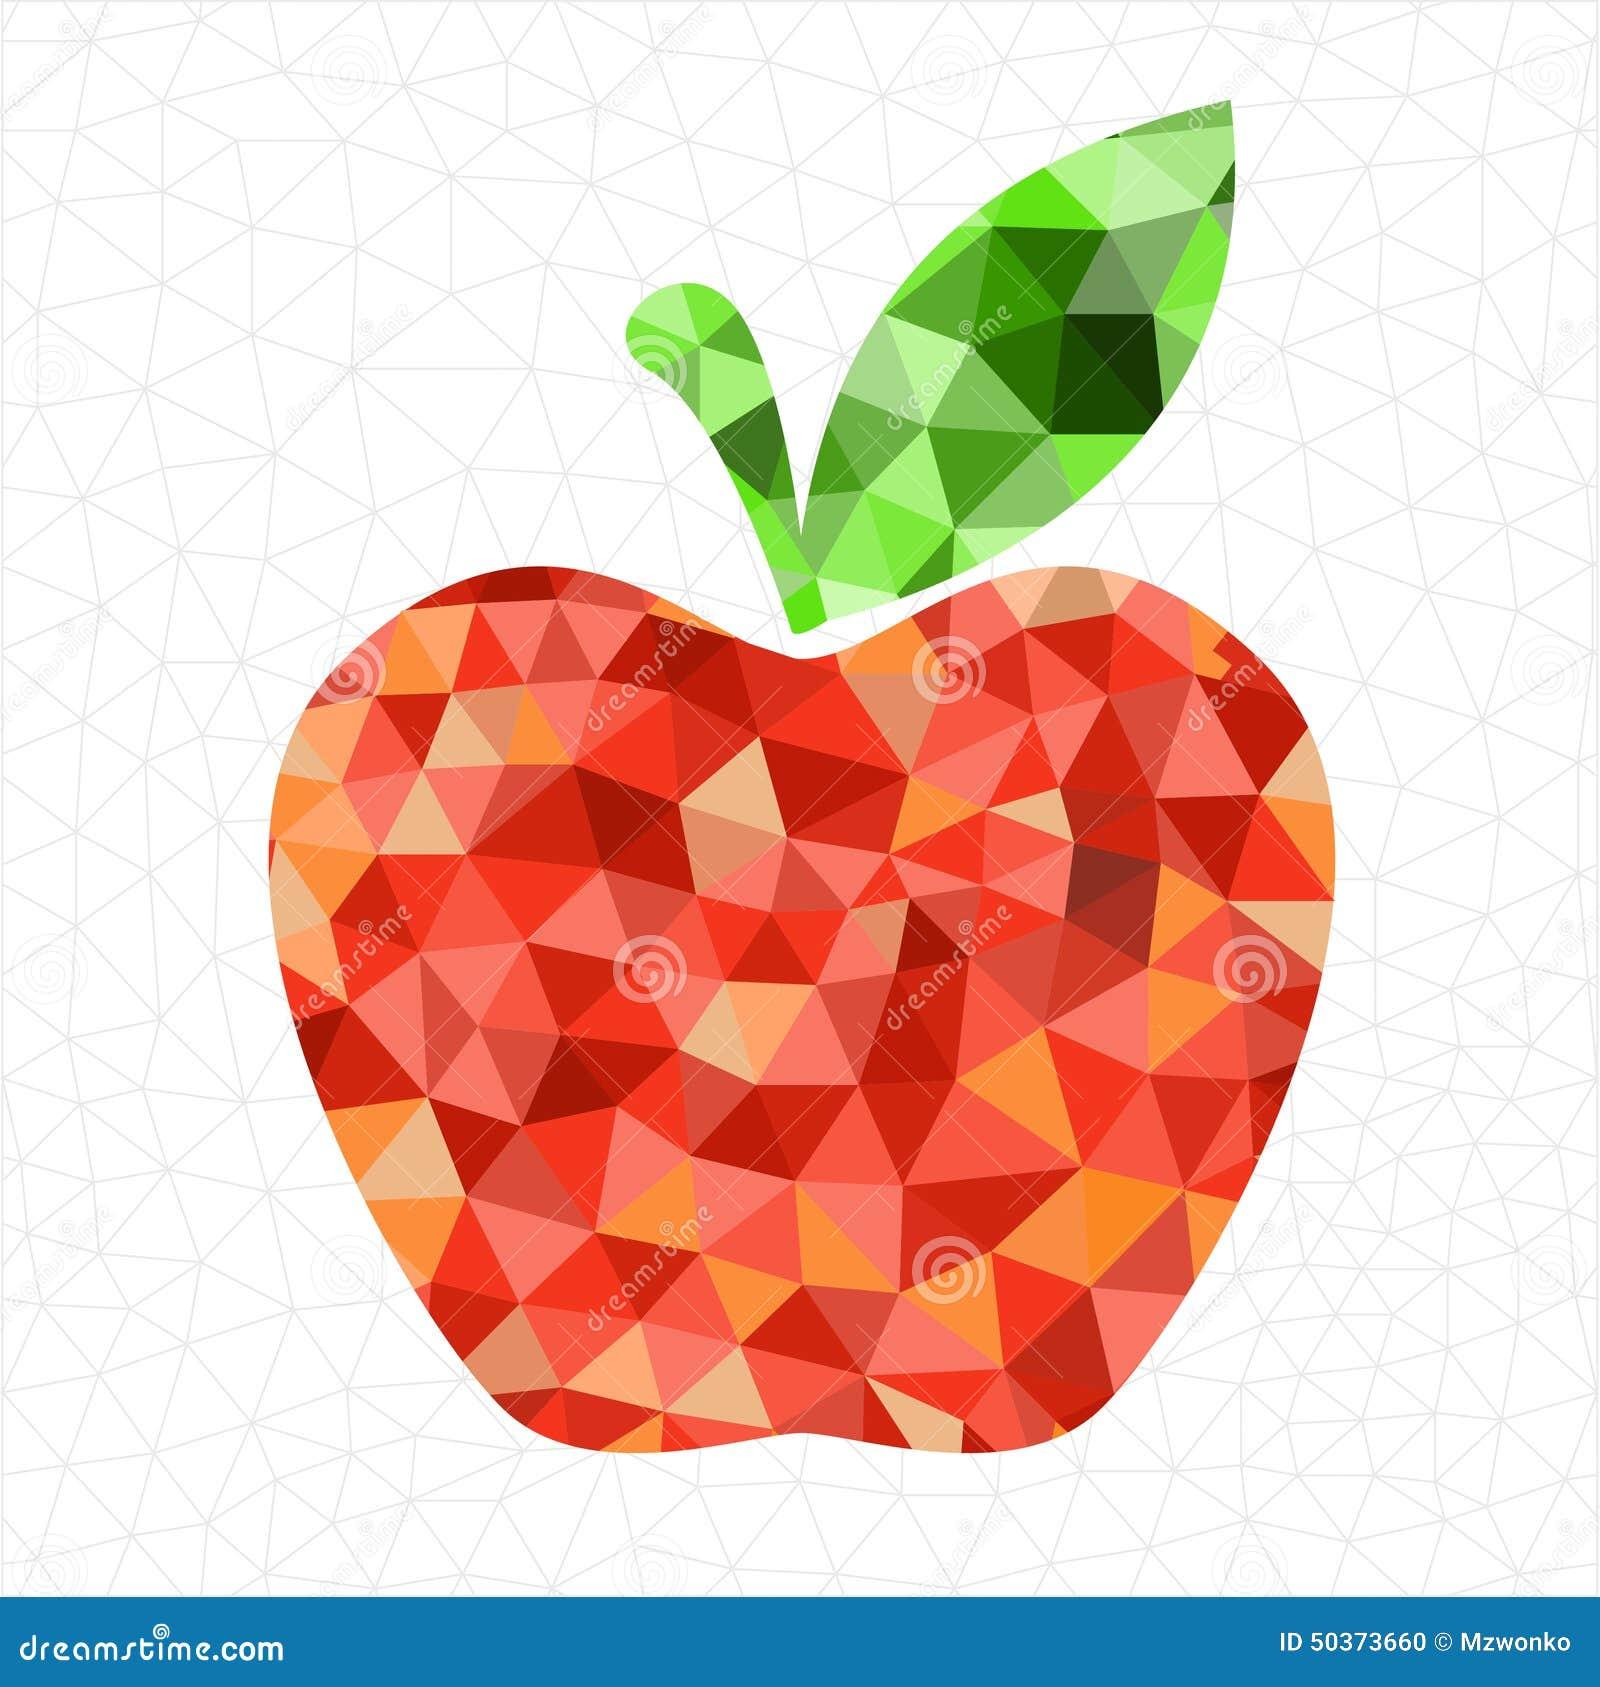 Beautiful Wallpaper Macbook Geometric - geometric-red-apple-abstract-triangled-background-pattern-50373660  Pic_928563.jpg